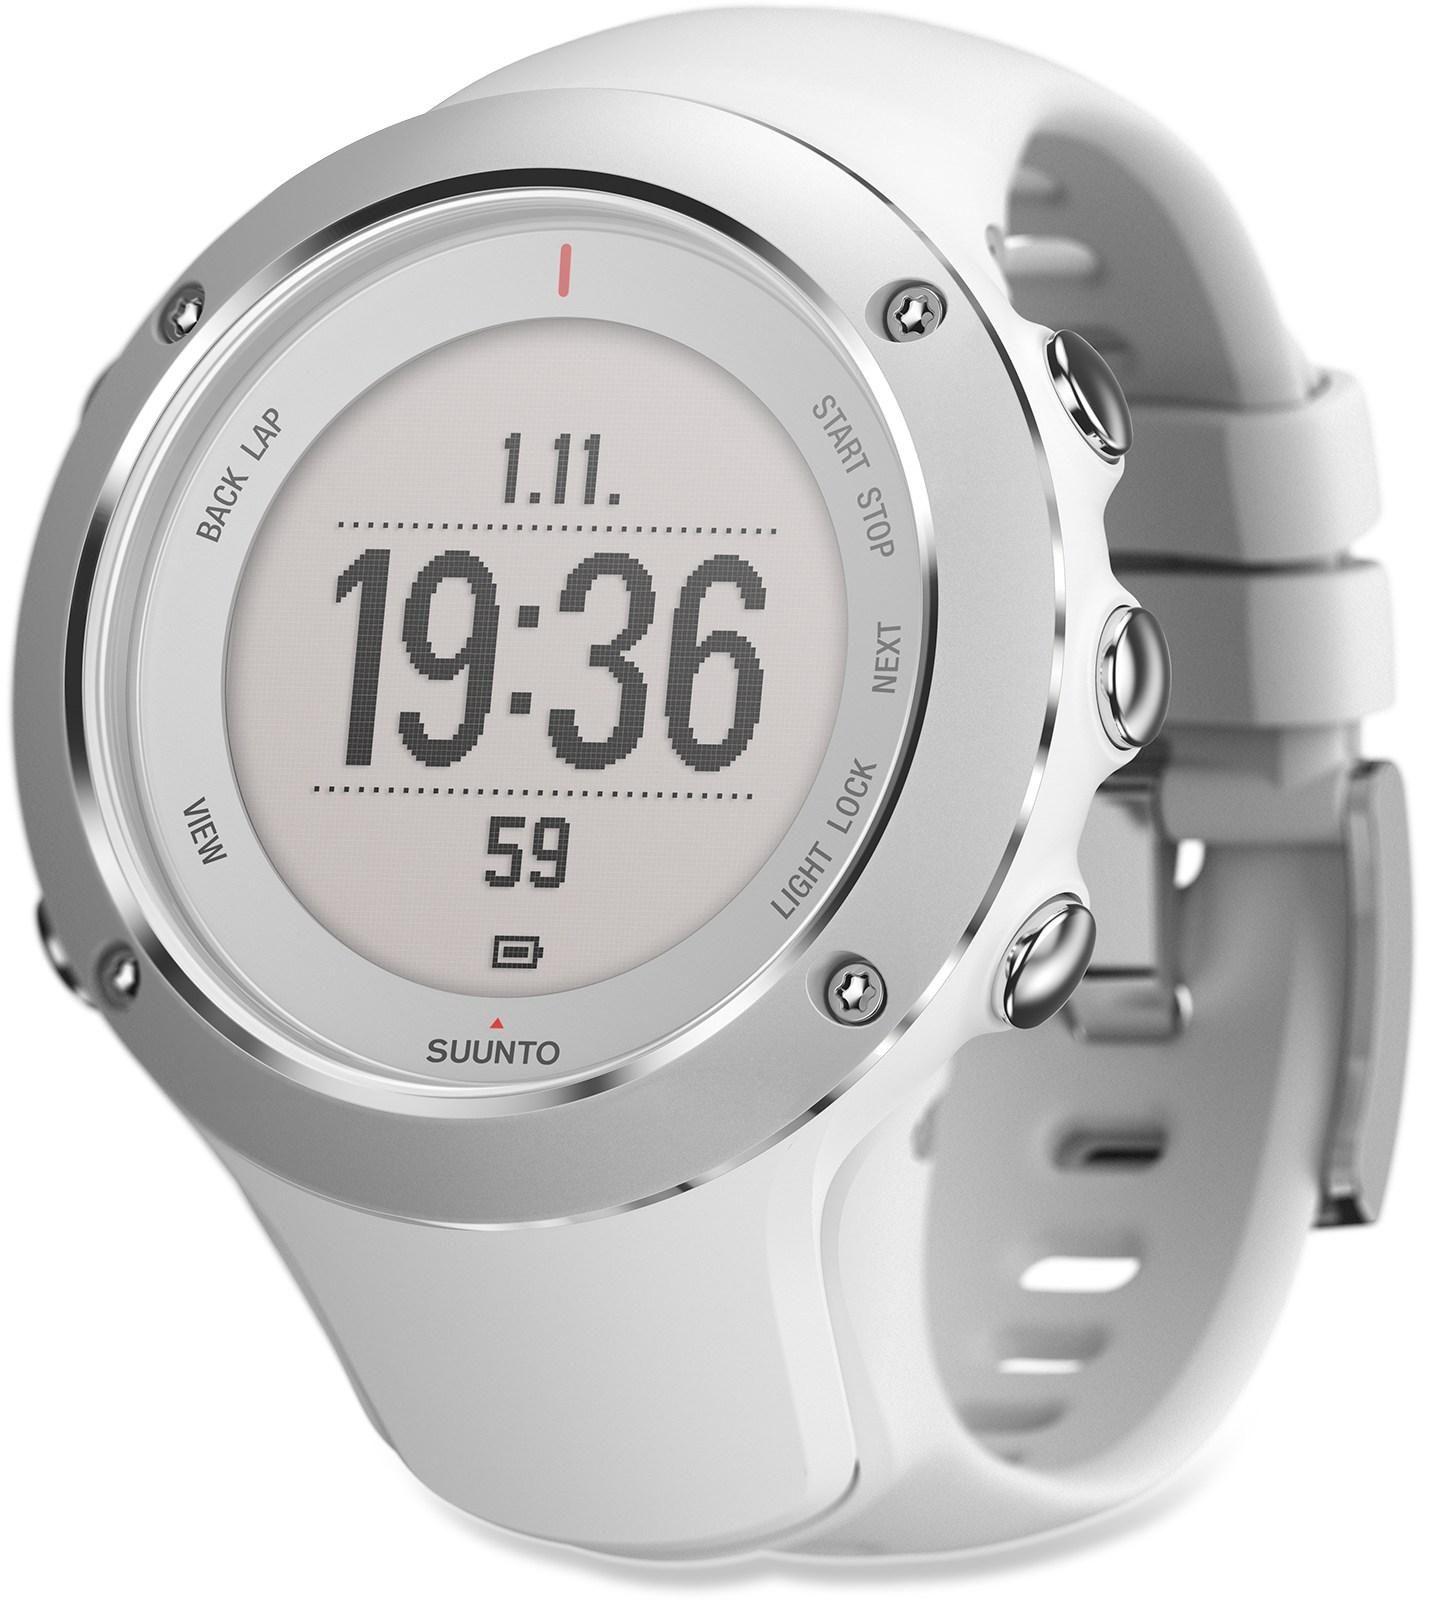 Suunto Ambit2 S GPS Multifunction Heart Rate Monitor REI